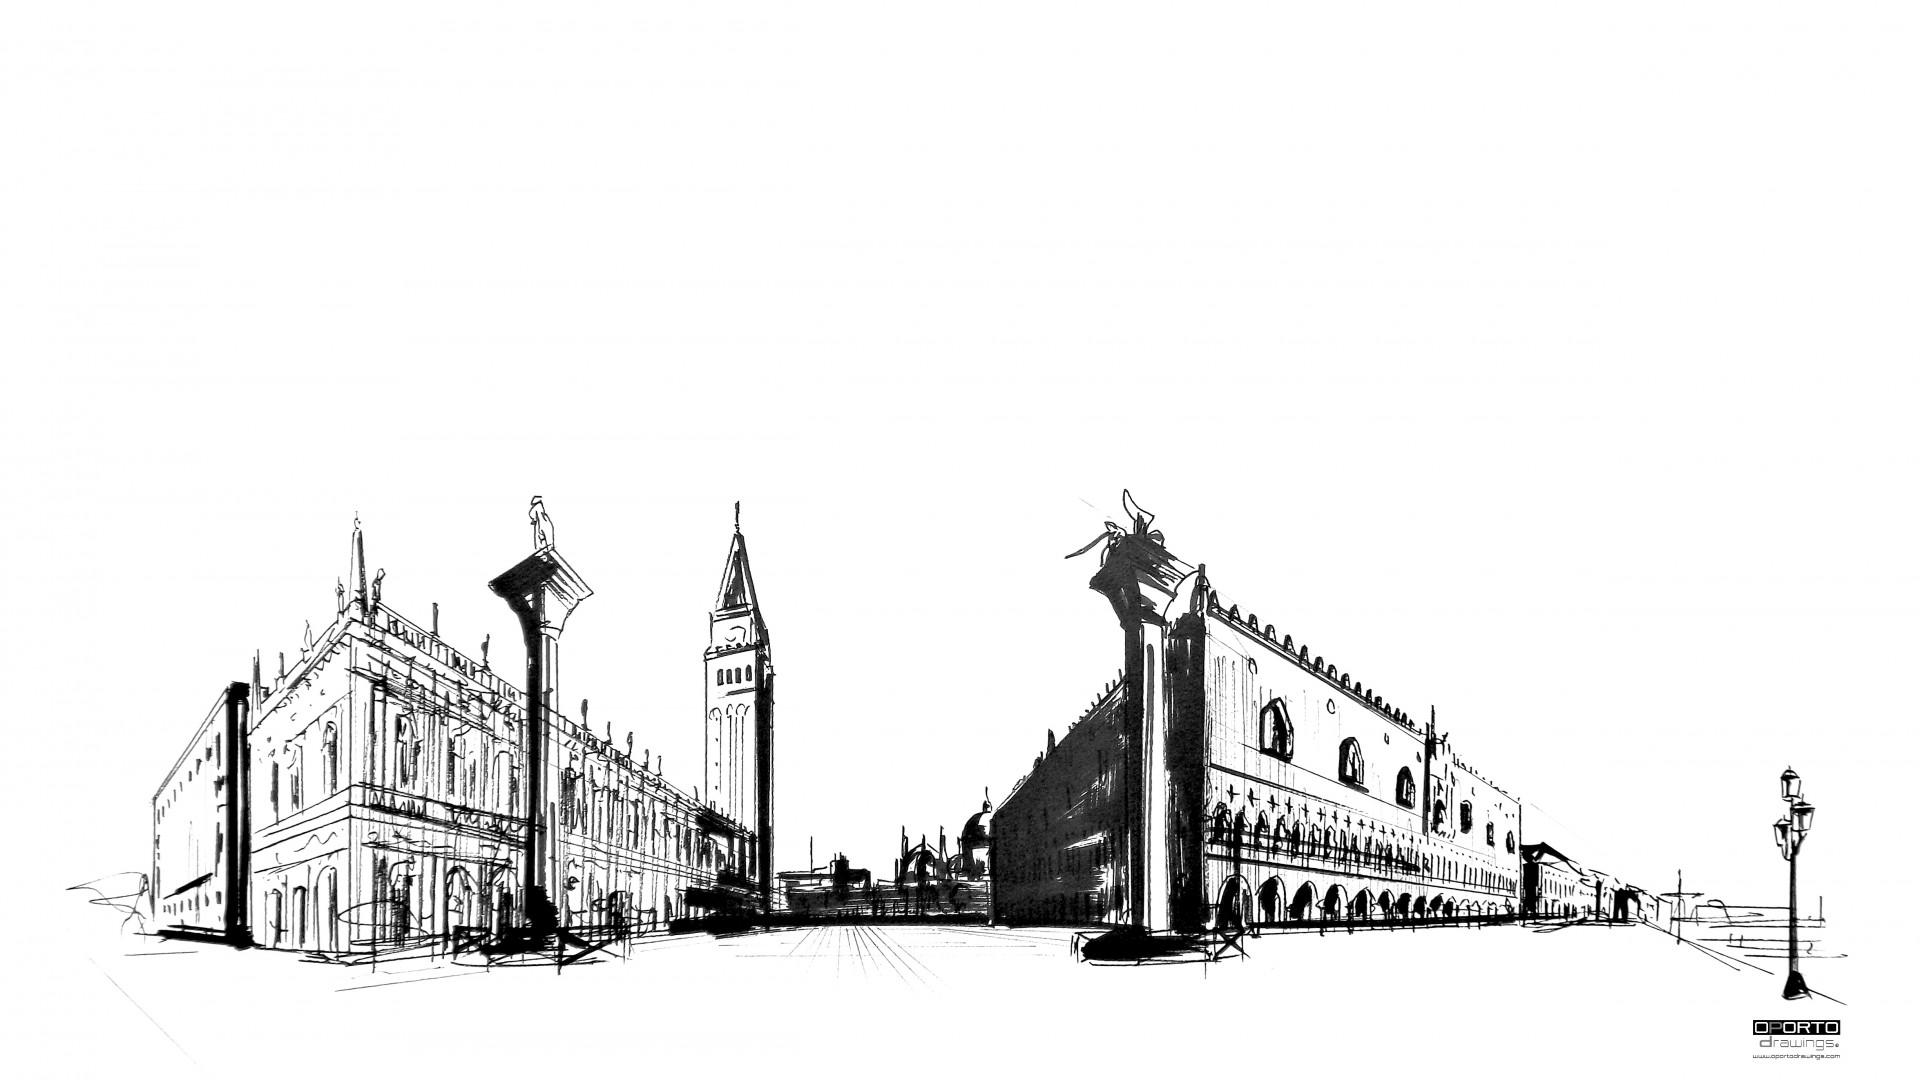 Praça de S. Marcos :: Veneza